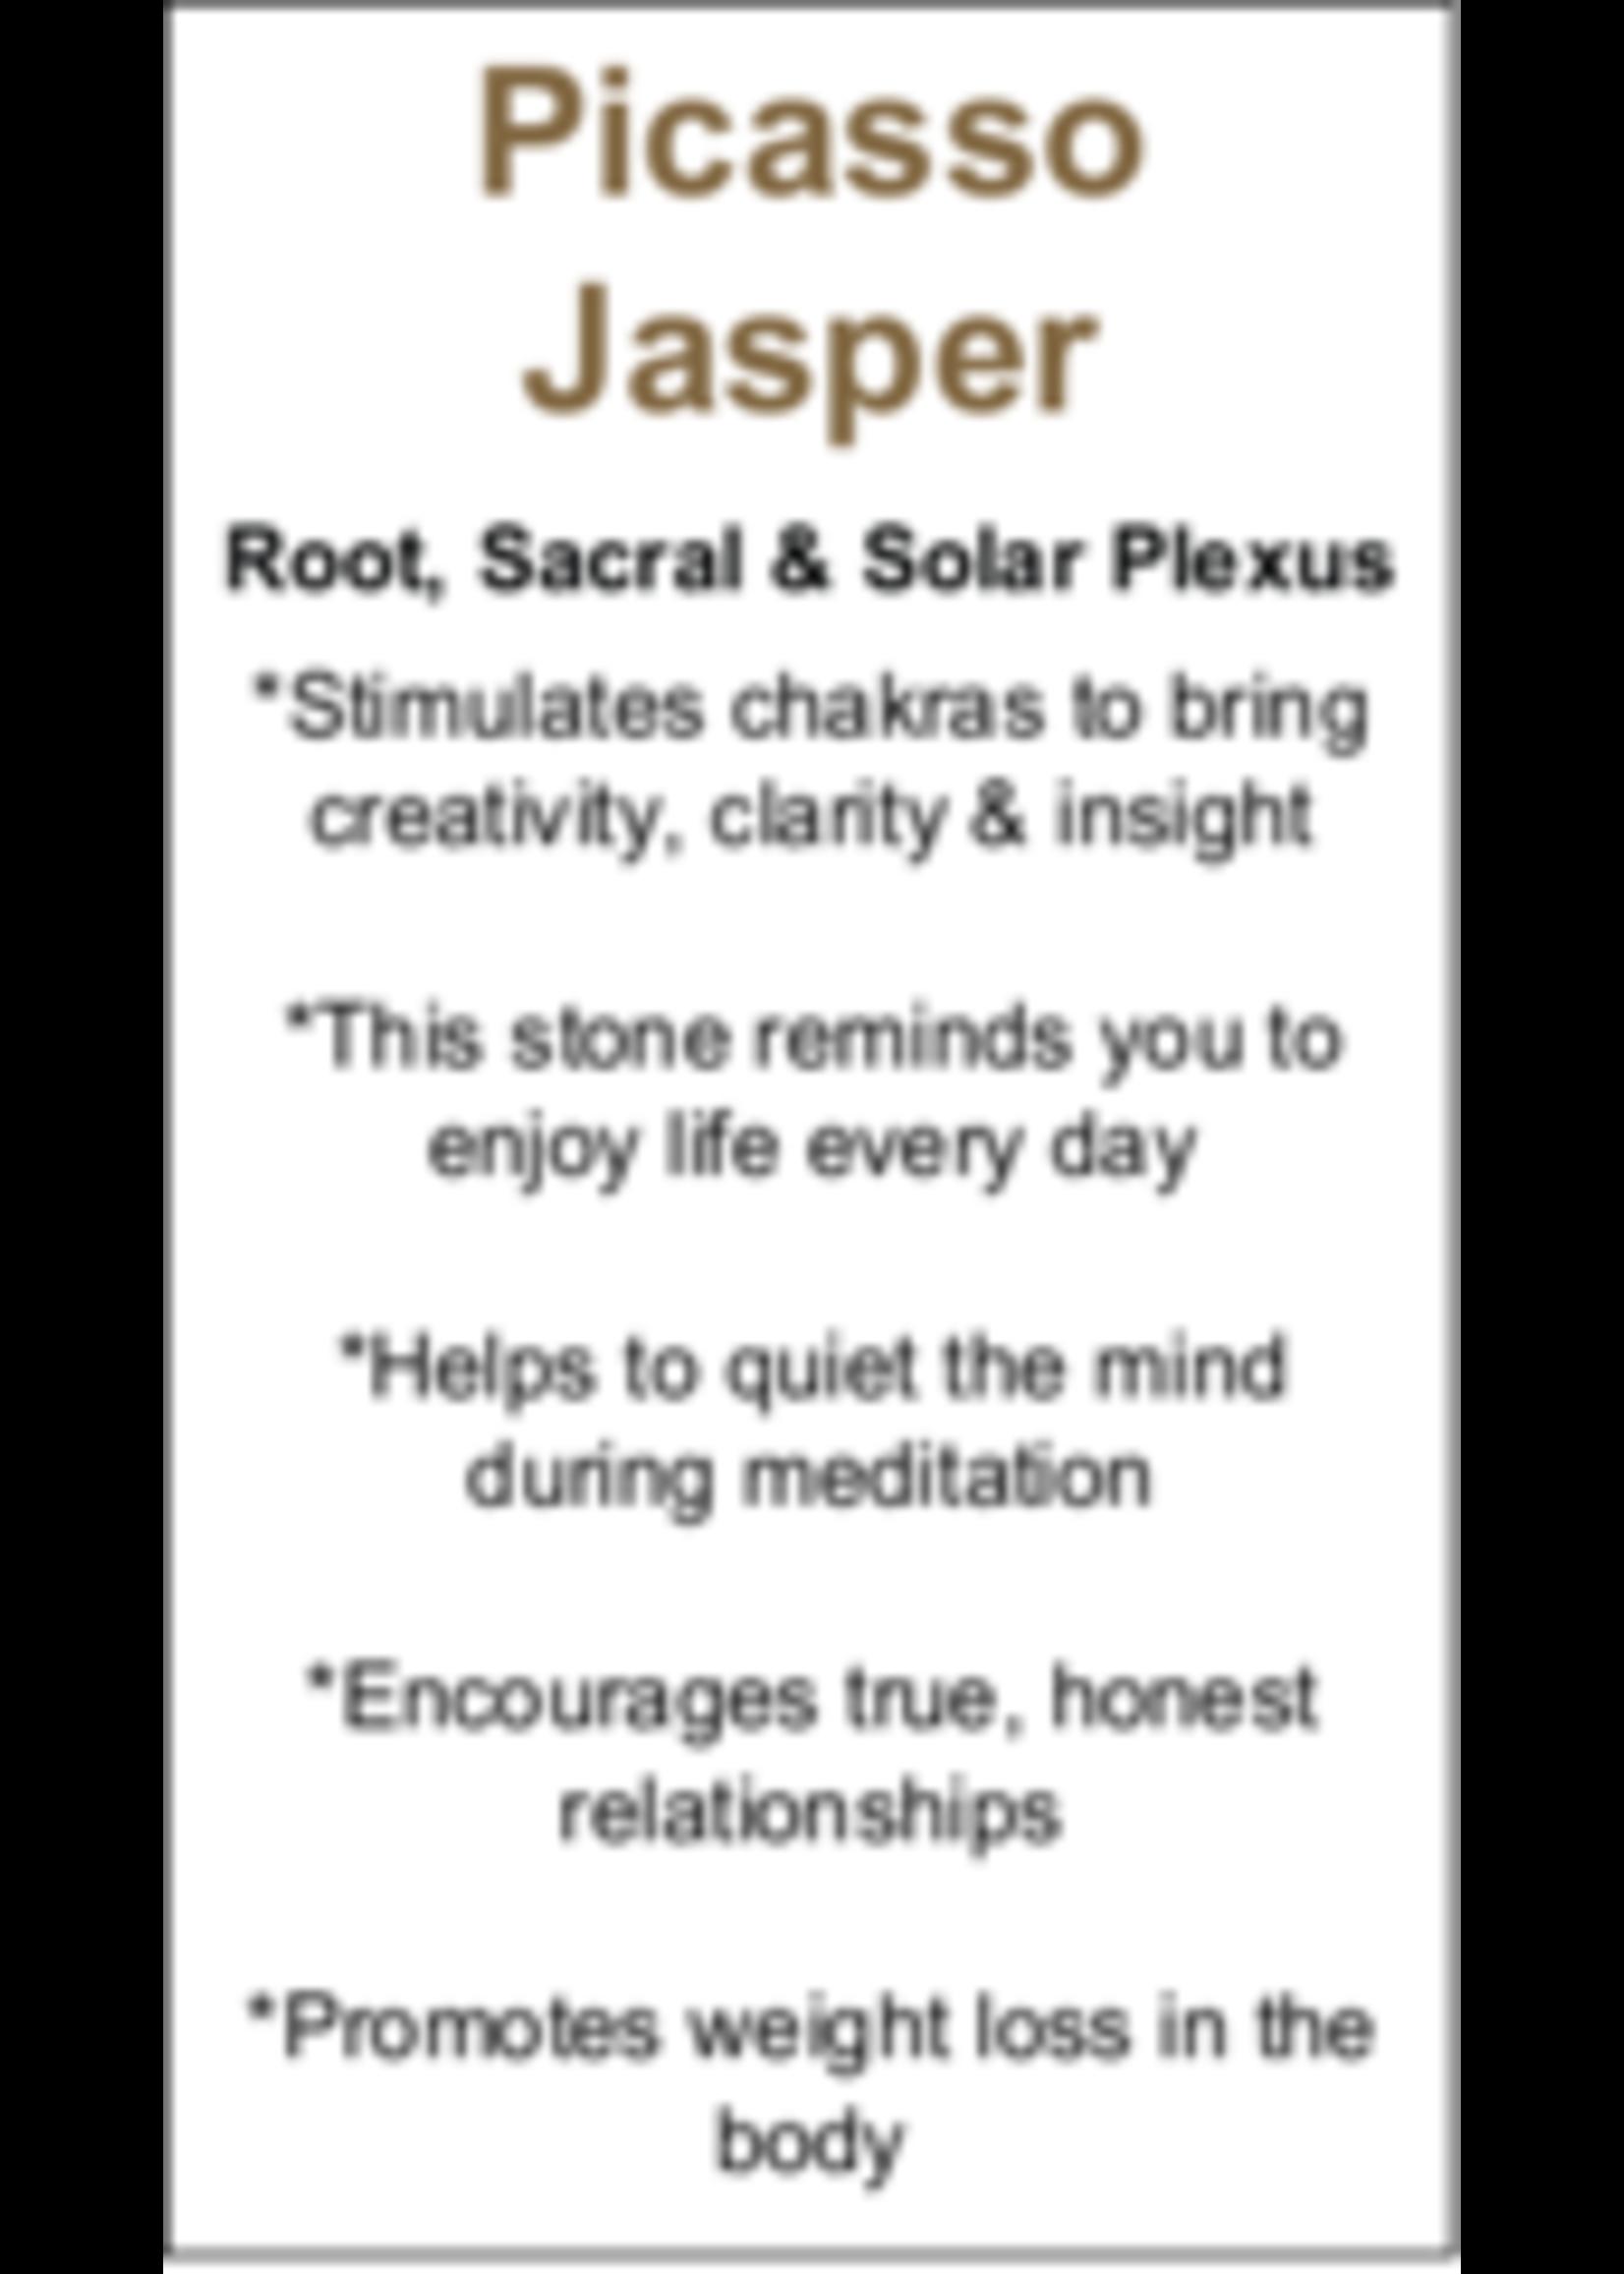 Picasso Jasper Cards - Box of 250